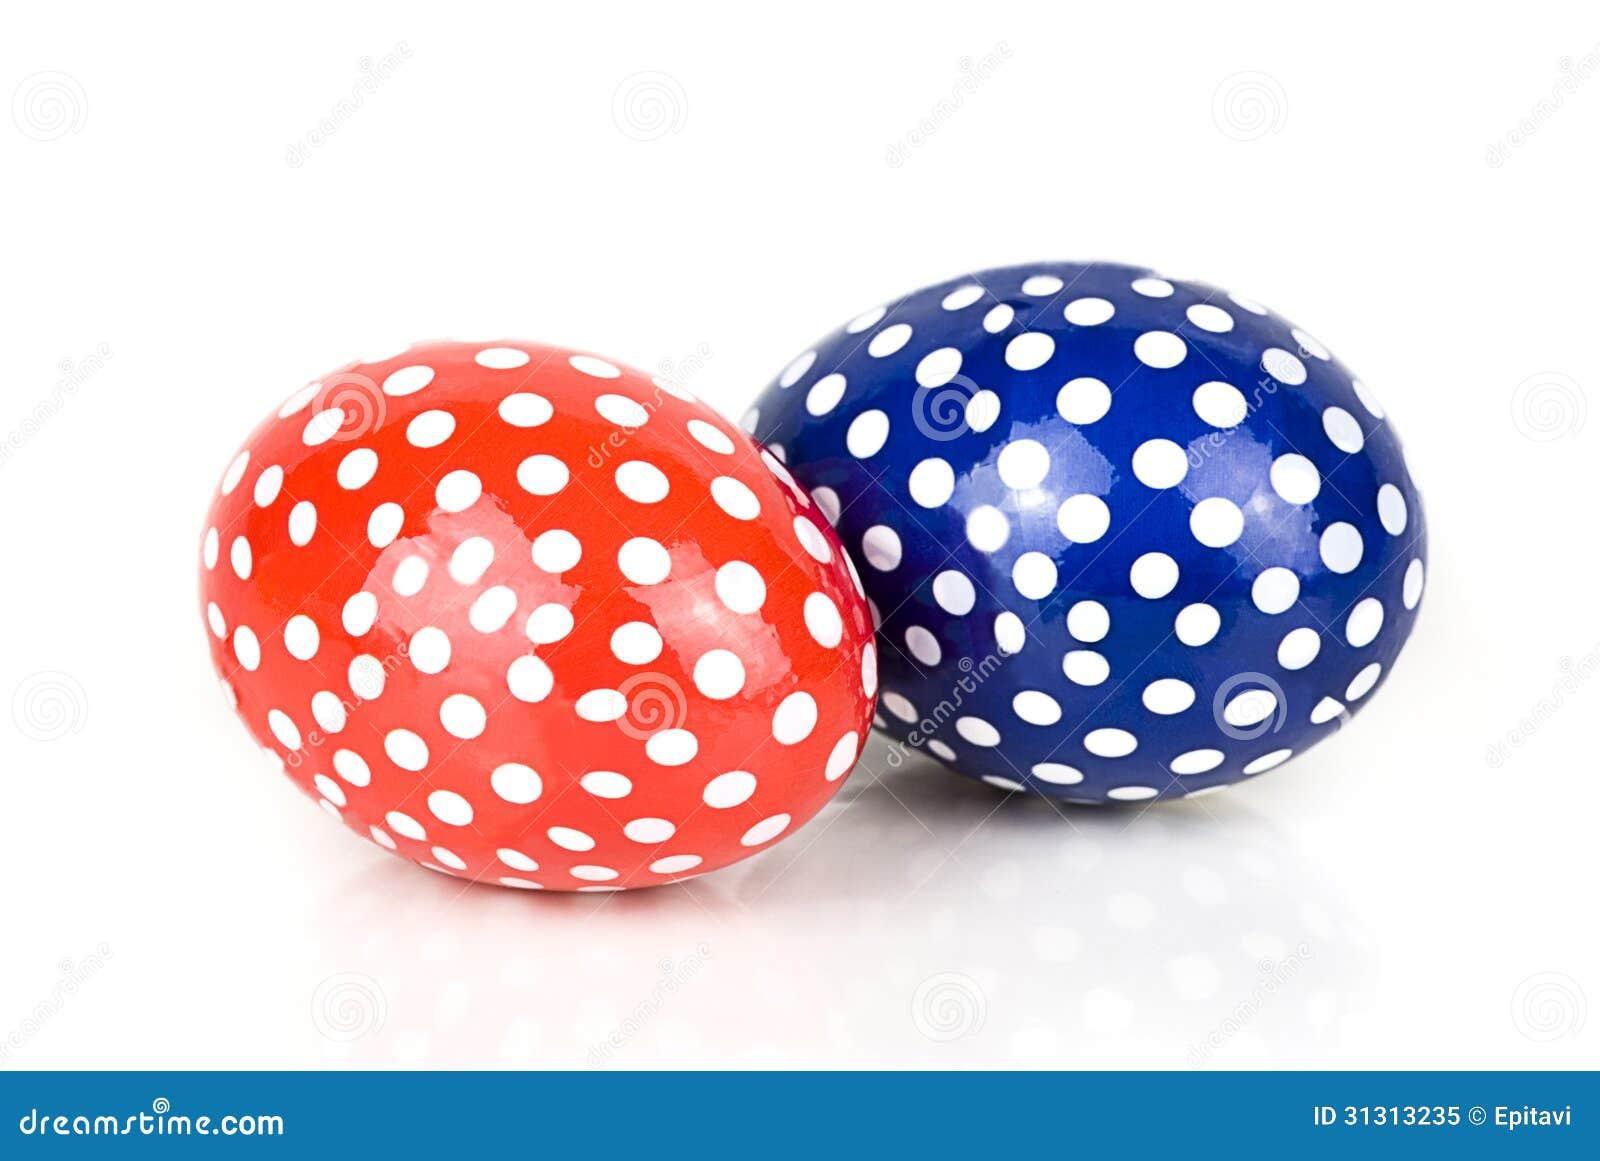 Two Easter Eggs Stock Image Of Season Dots Yellow